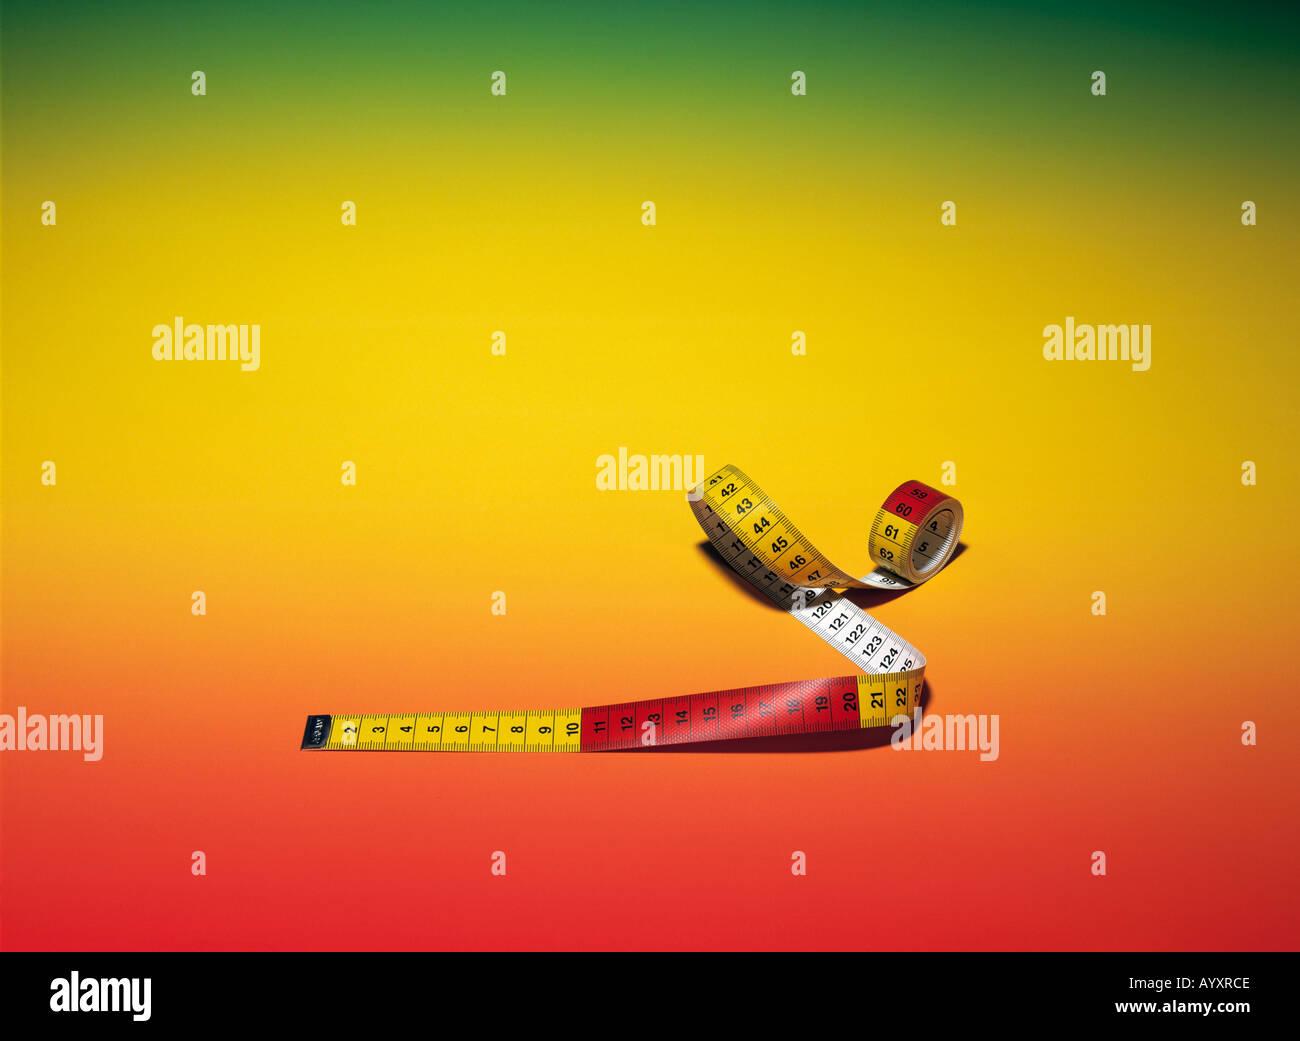 measuring tape, measure, background, coloured, studio photograph, symbolism, symbolical Stock Photo